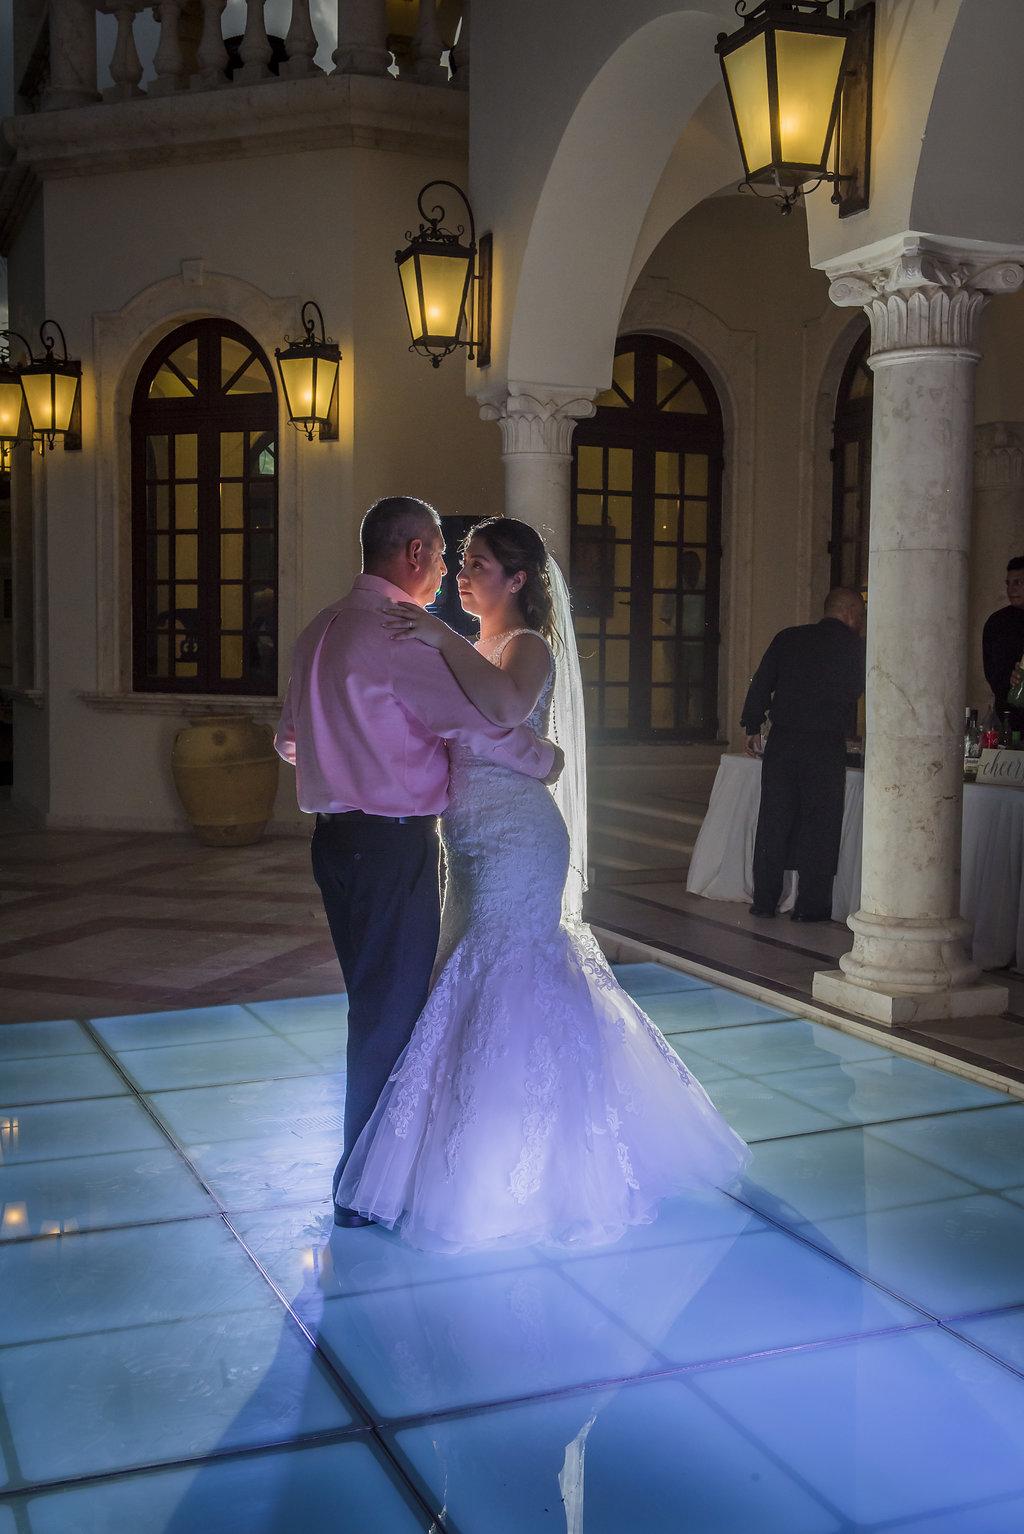 yesica-jose-beach-wedding-Villa-La-Joya--Playa-del-carmen-01--37.jpg